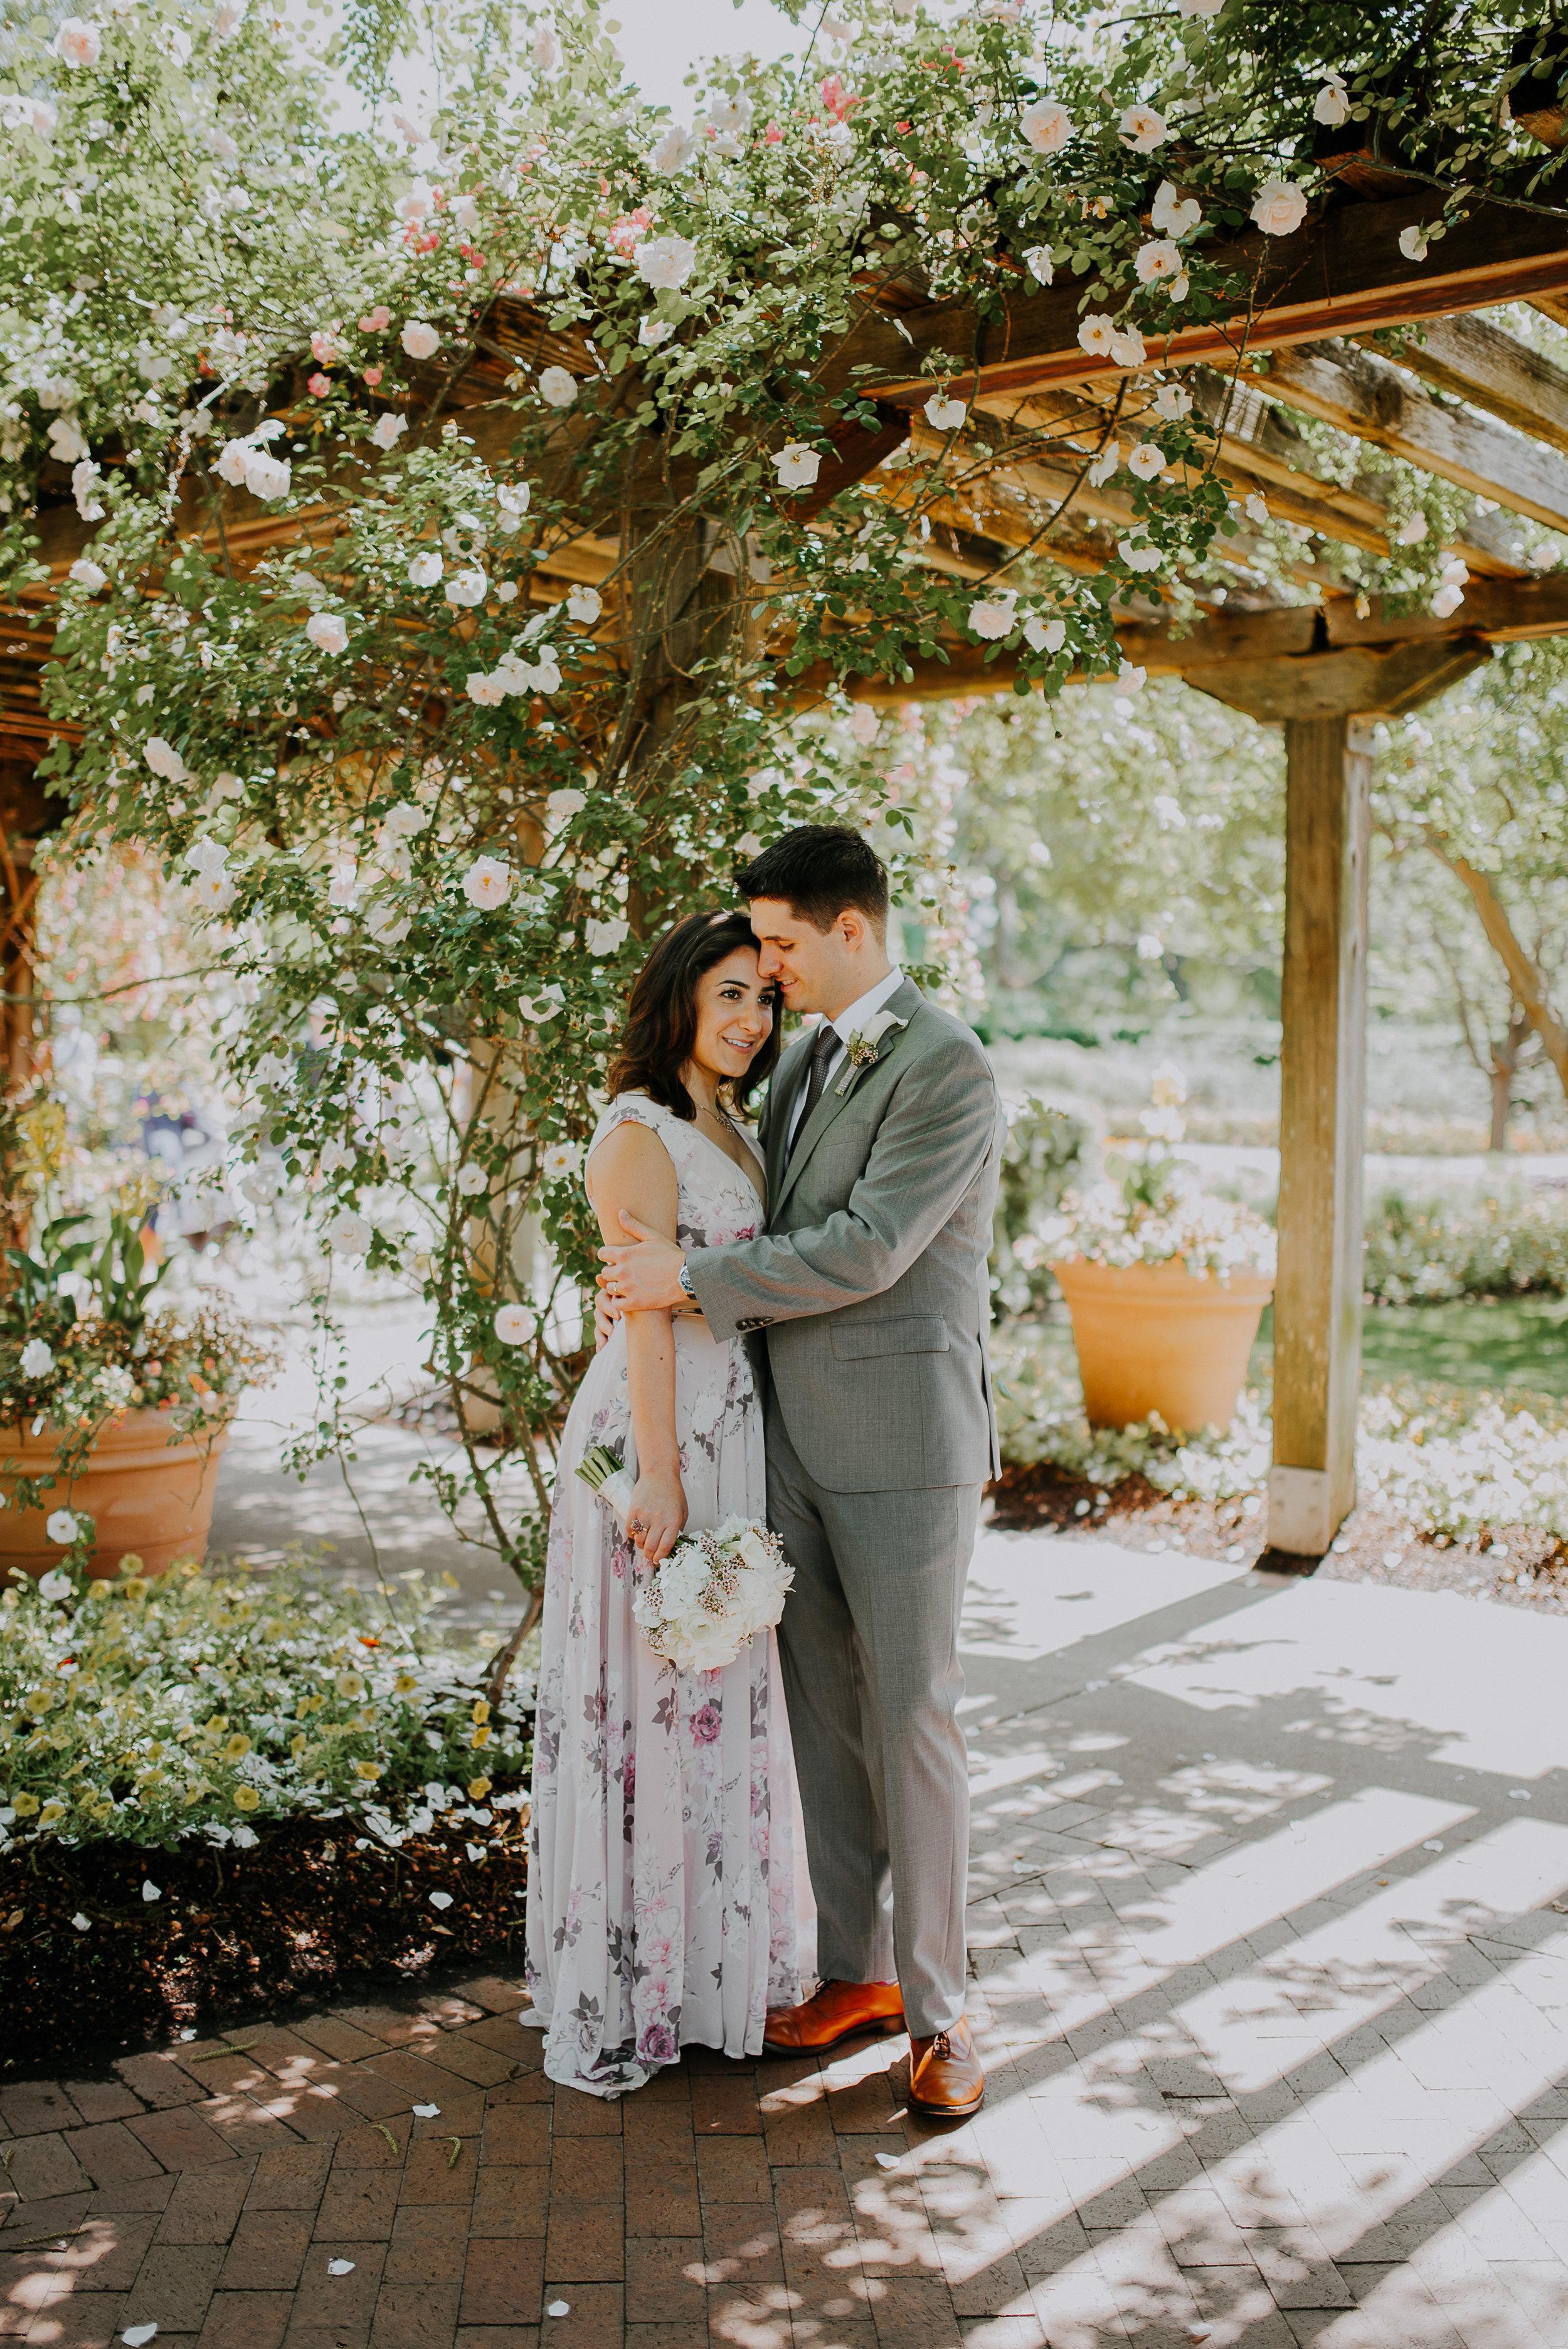 Dallas-fort-worth-wedding-photographer-dallas-arboretum-intimate-wedding-dallas-texas-41